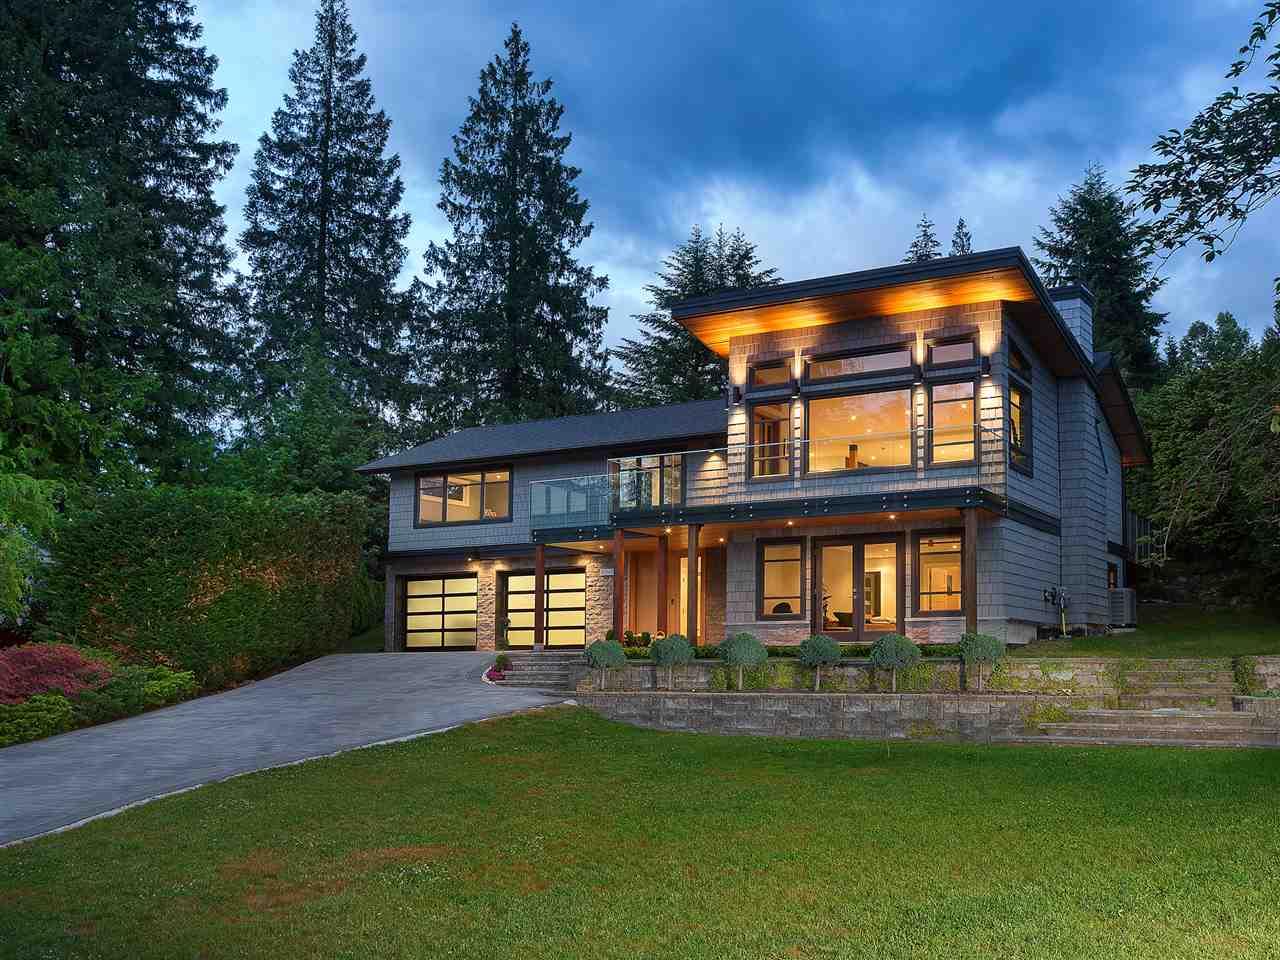 40147 BILL'S PLACE, Squamish, BC V0N 1T0